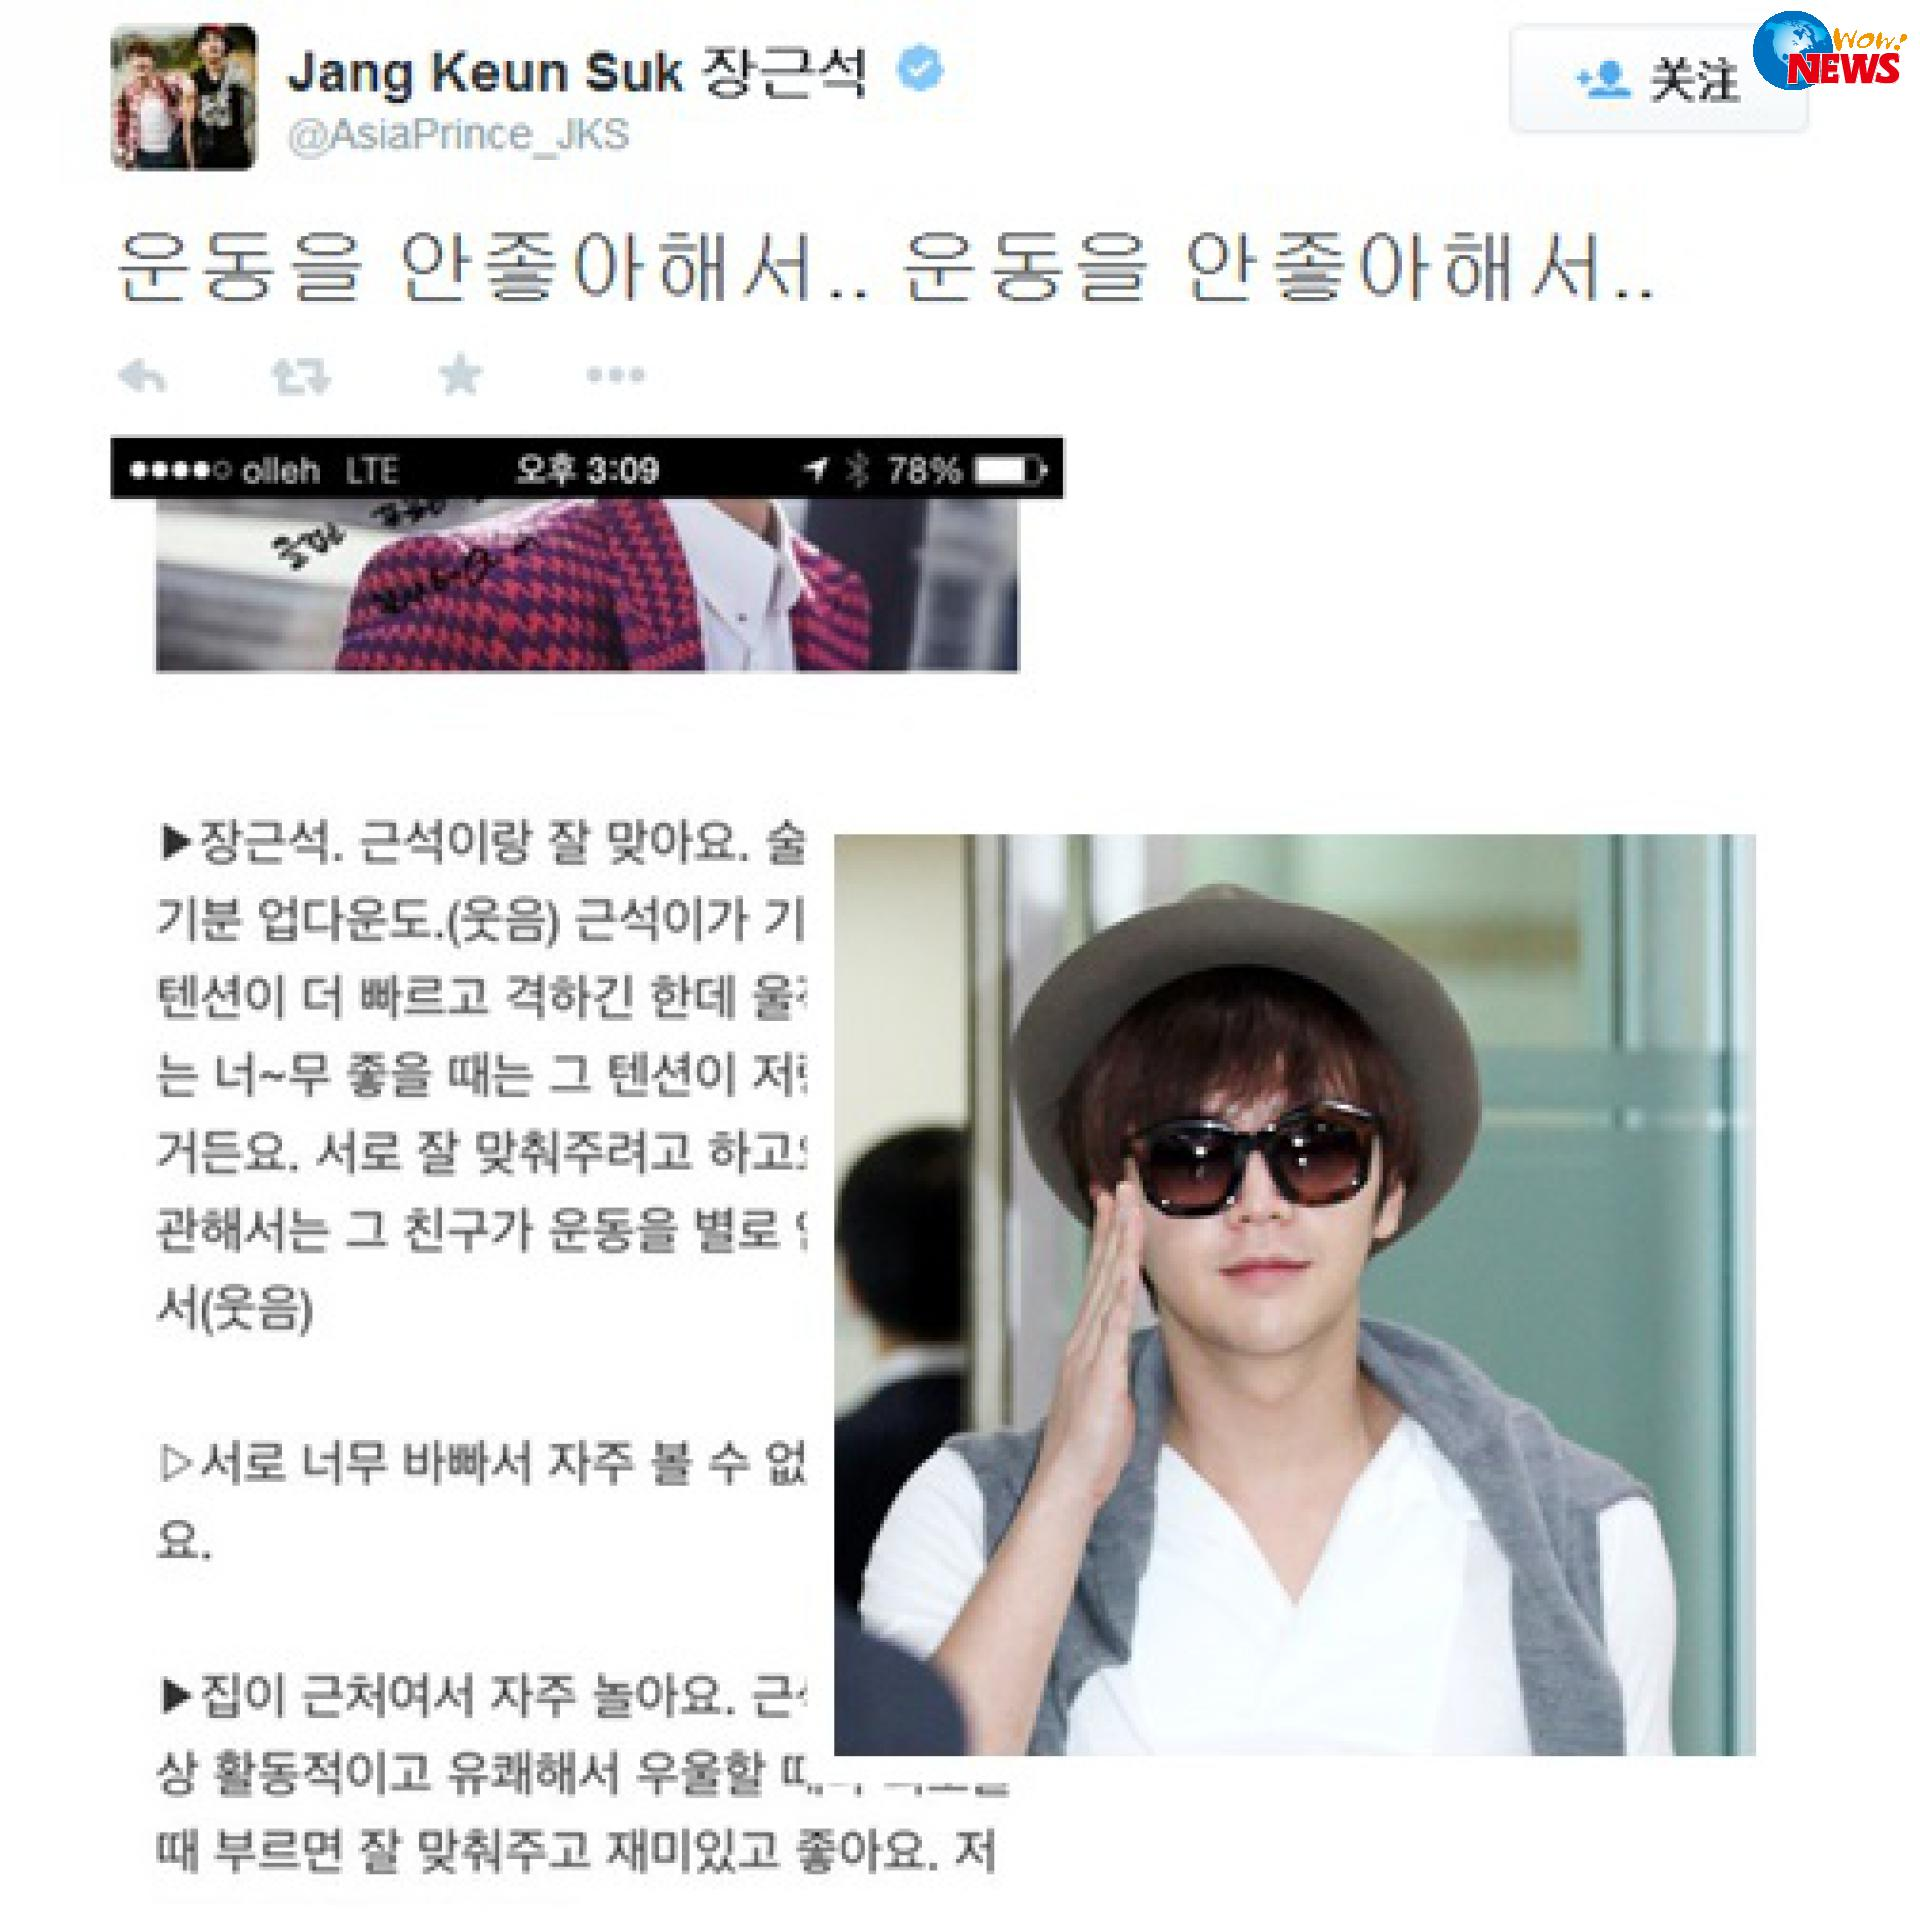 super junior清晨出国惺忪未醒 henry机场刮脸搞怪卖萌 高清图片